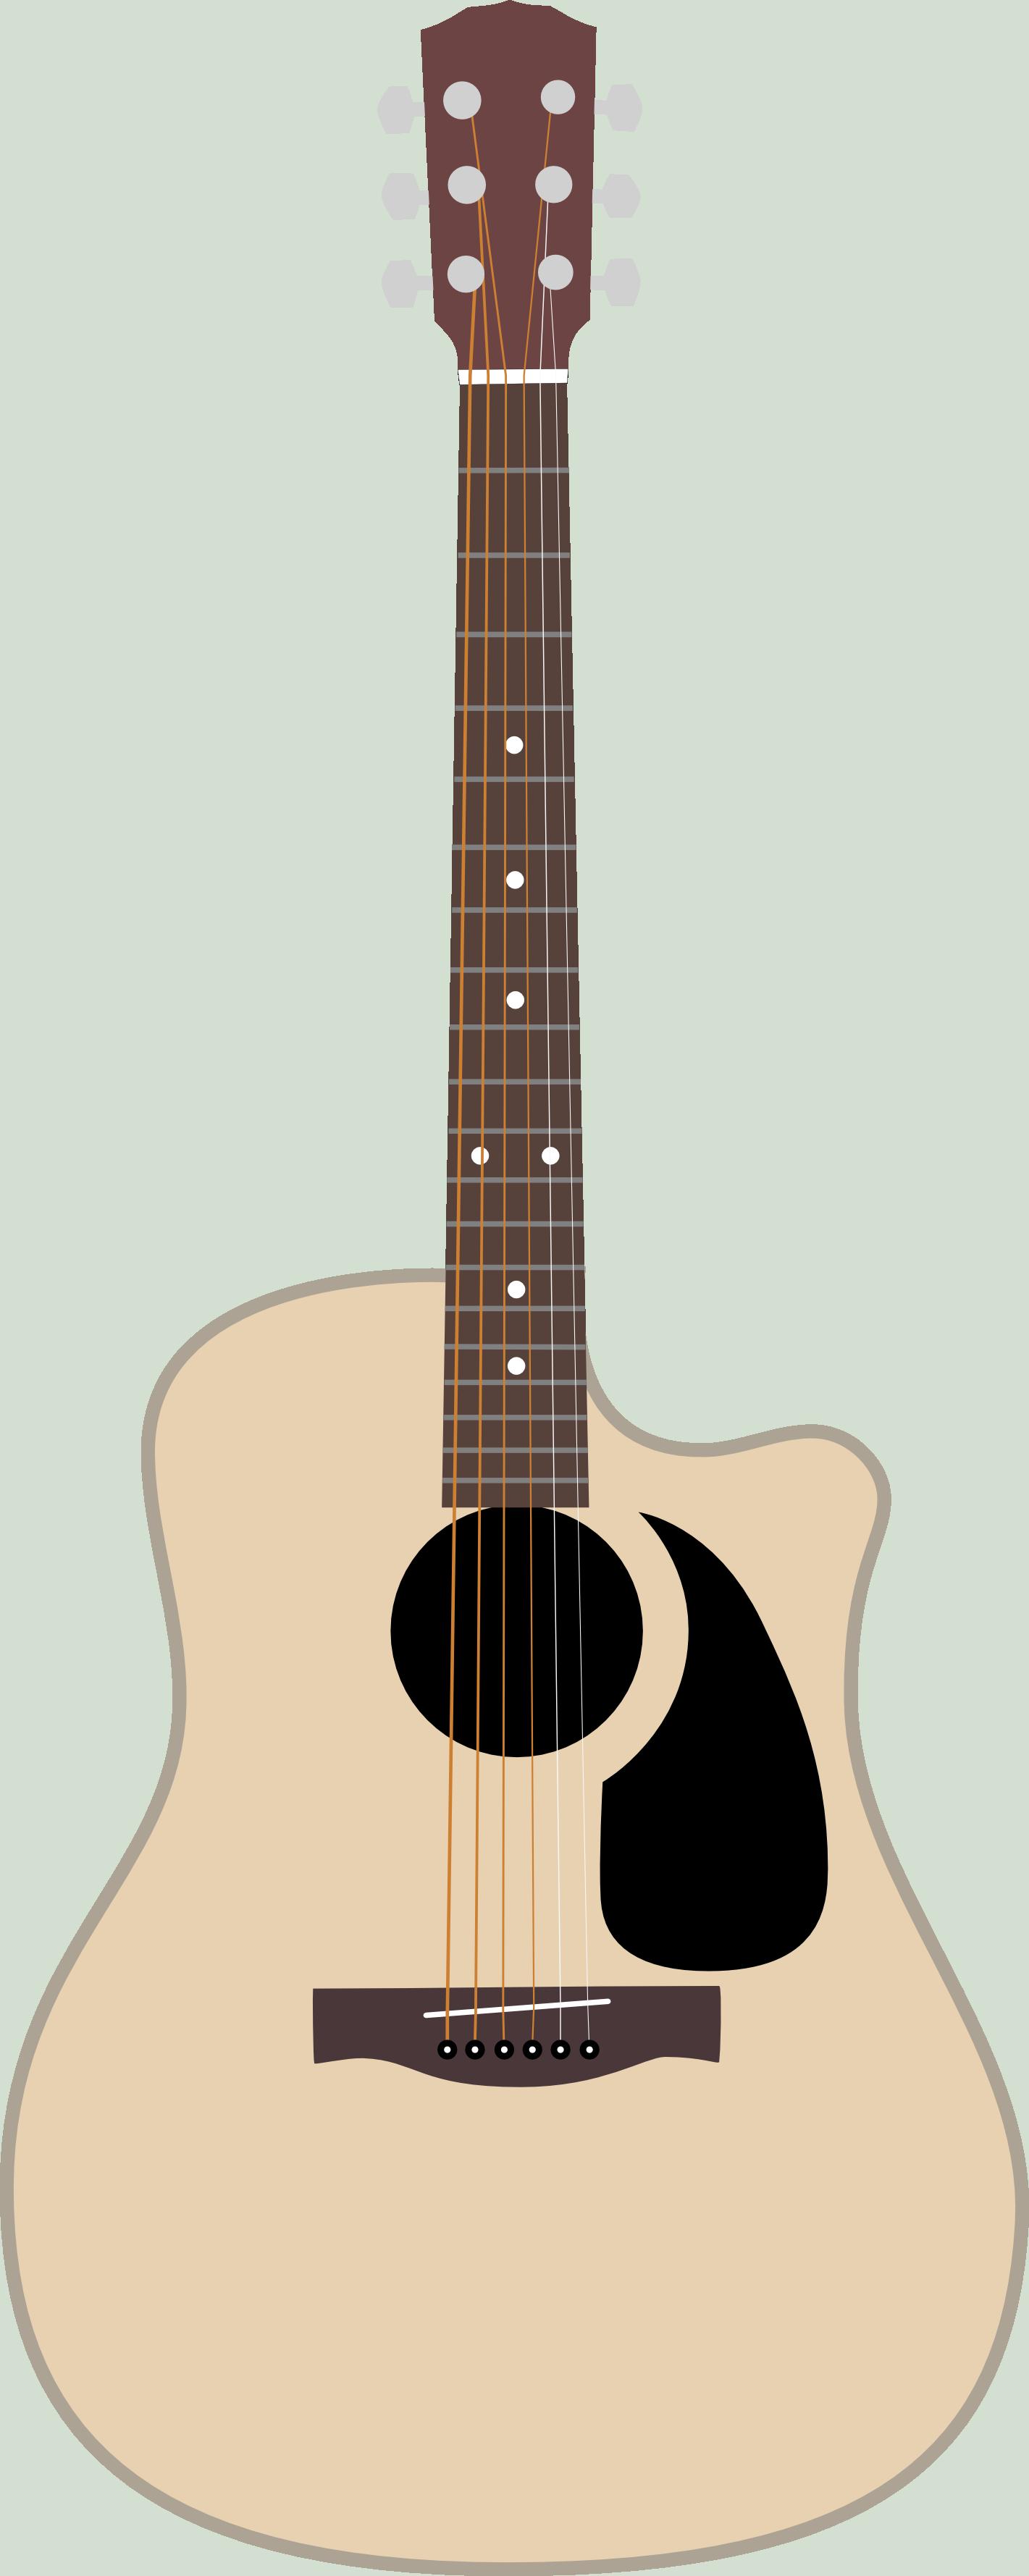 fender guitar outline - photo #41